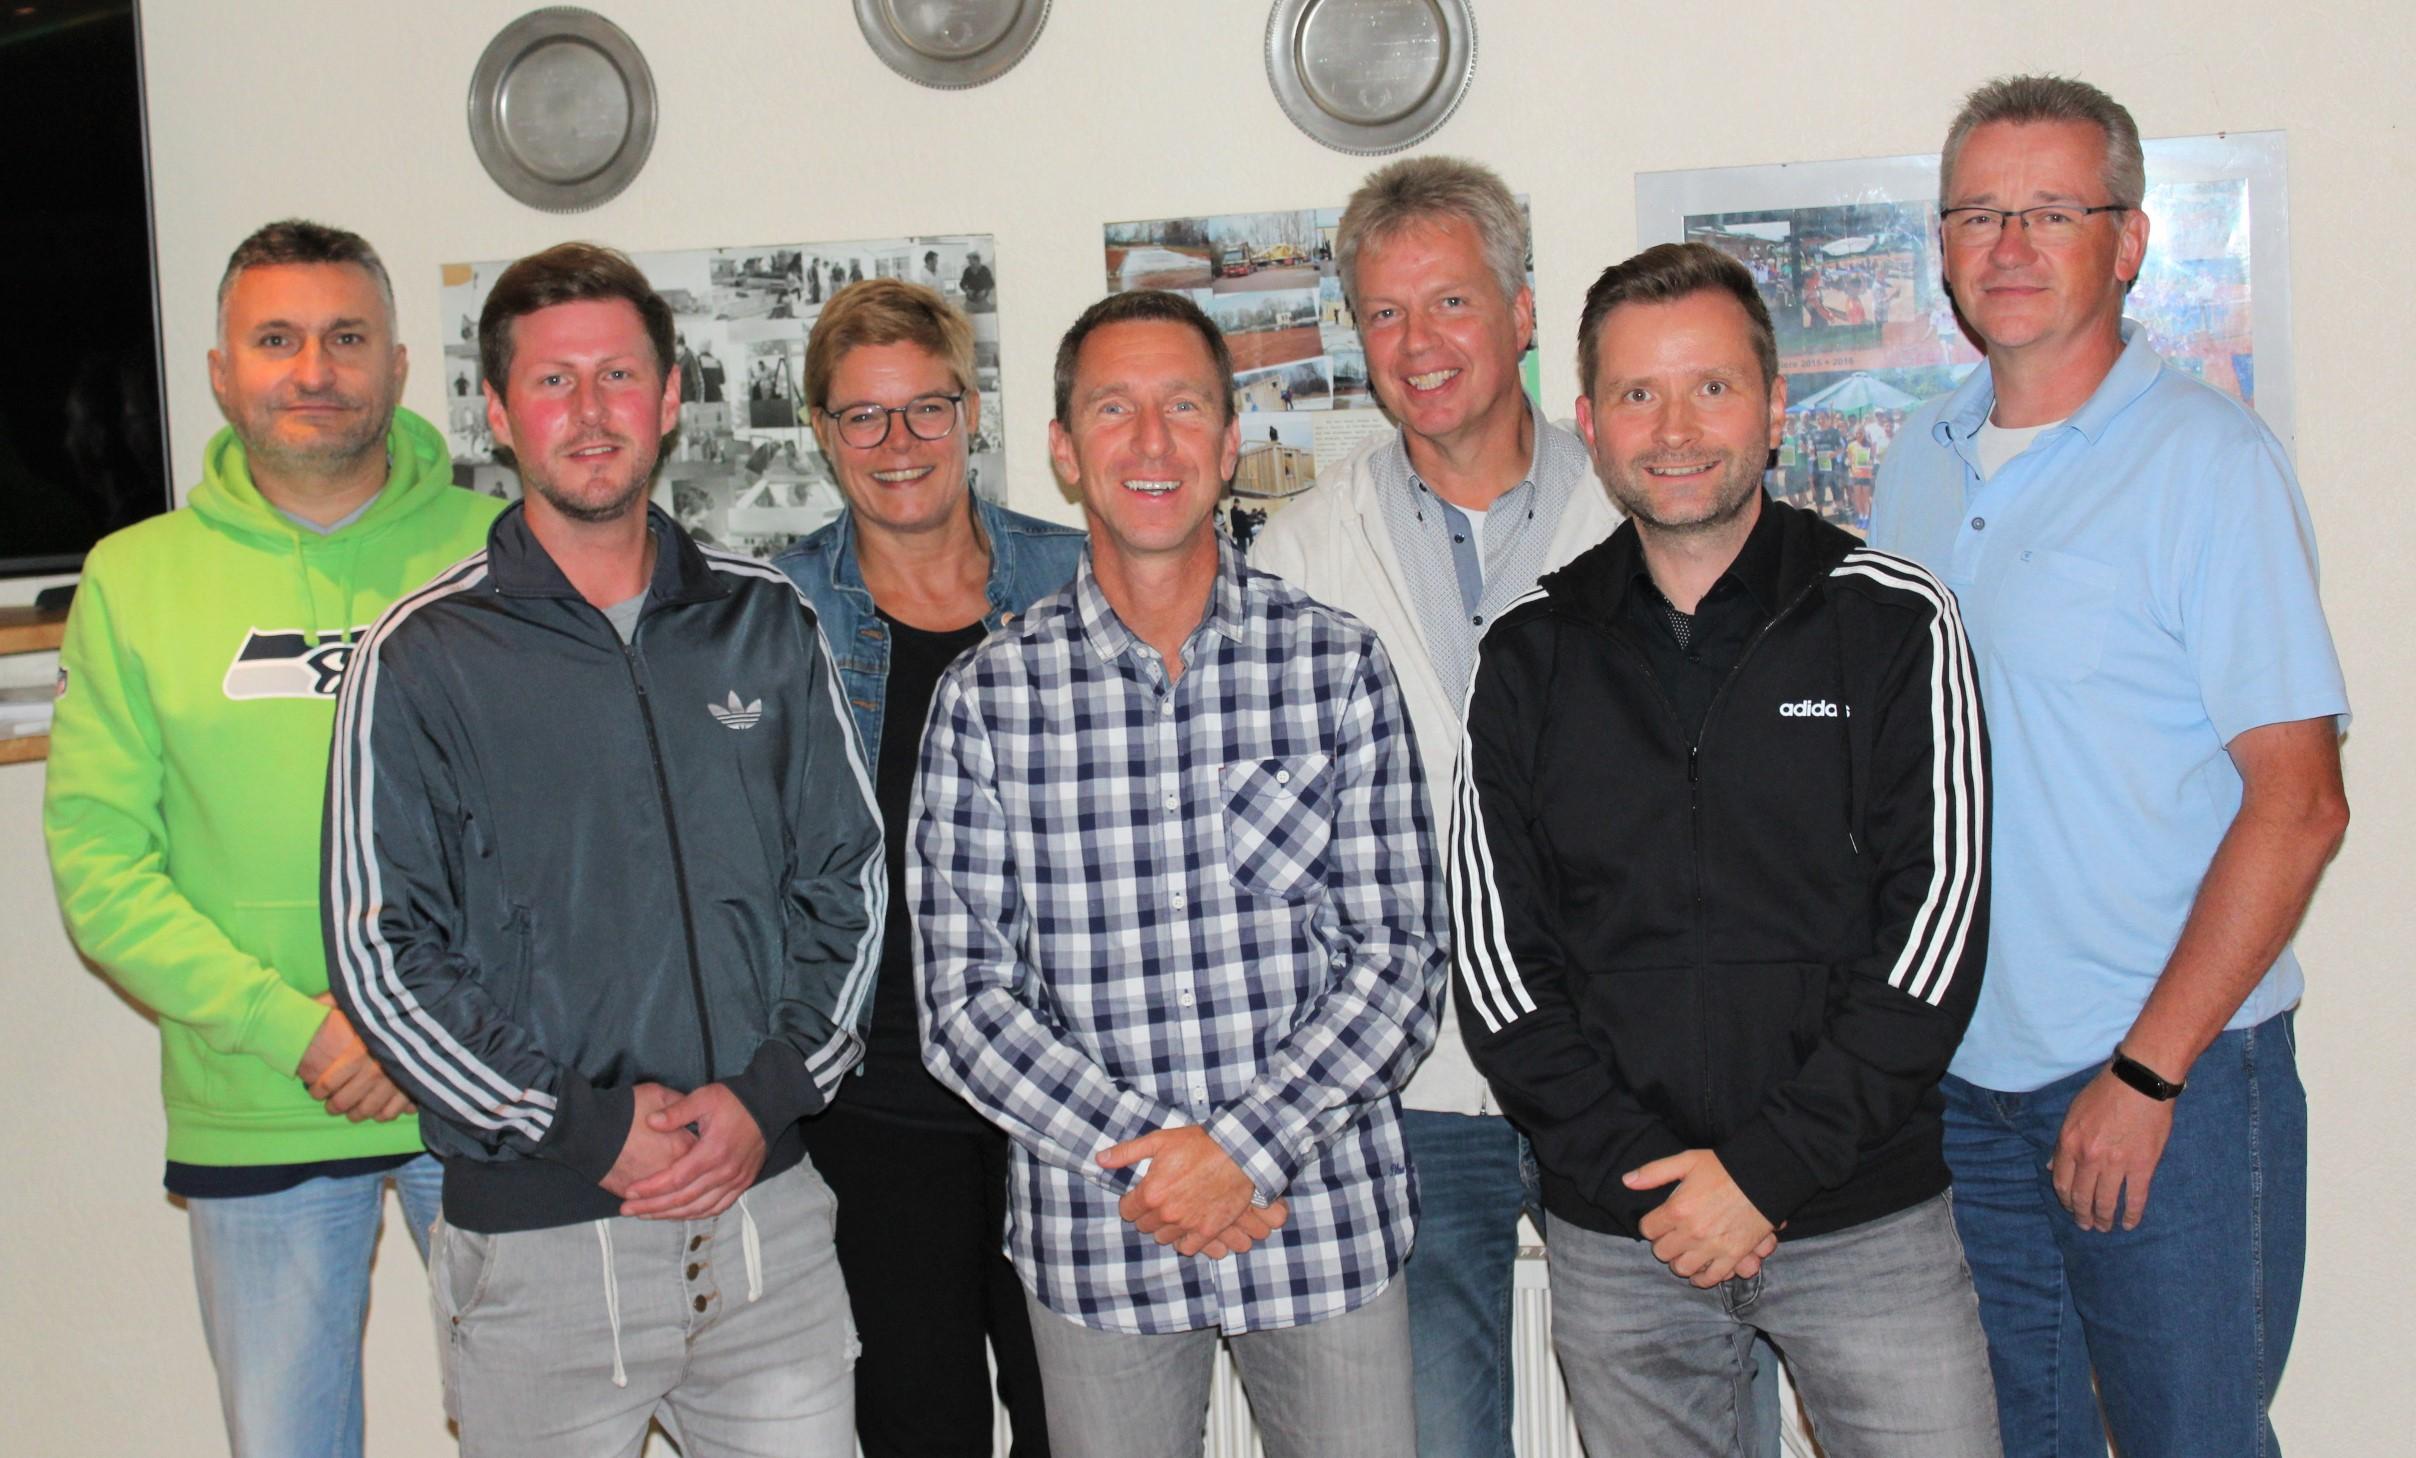 v.l.n.r.:  Rene Fröhlich, Benjamin Baris, Barbara Schieke, Lars Geveke, Dirk Hinrichs, Uwe Pierdziwol